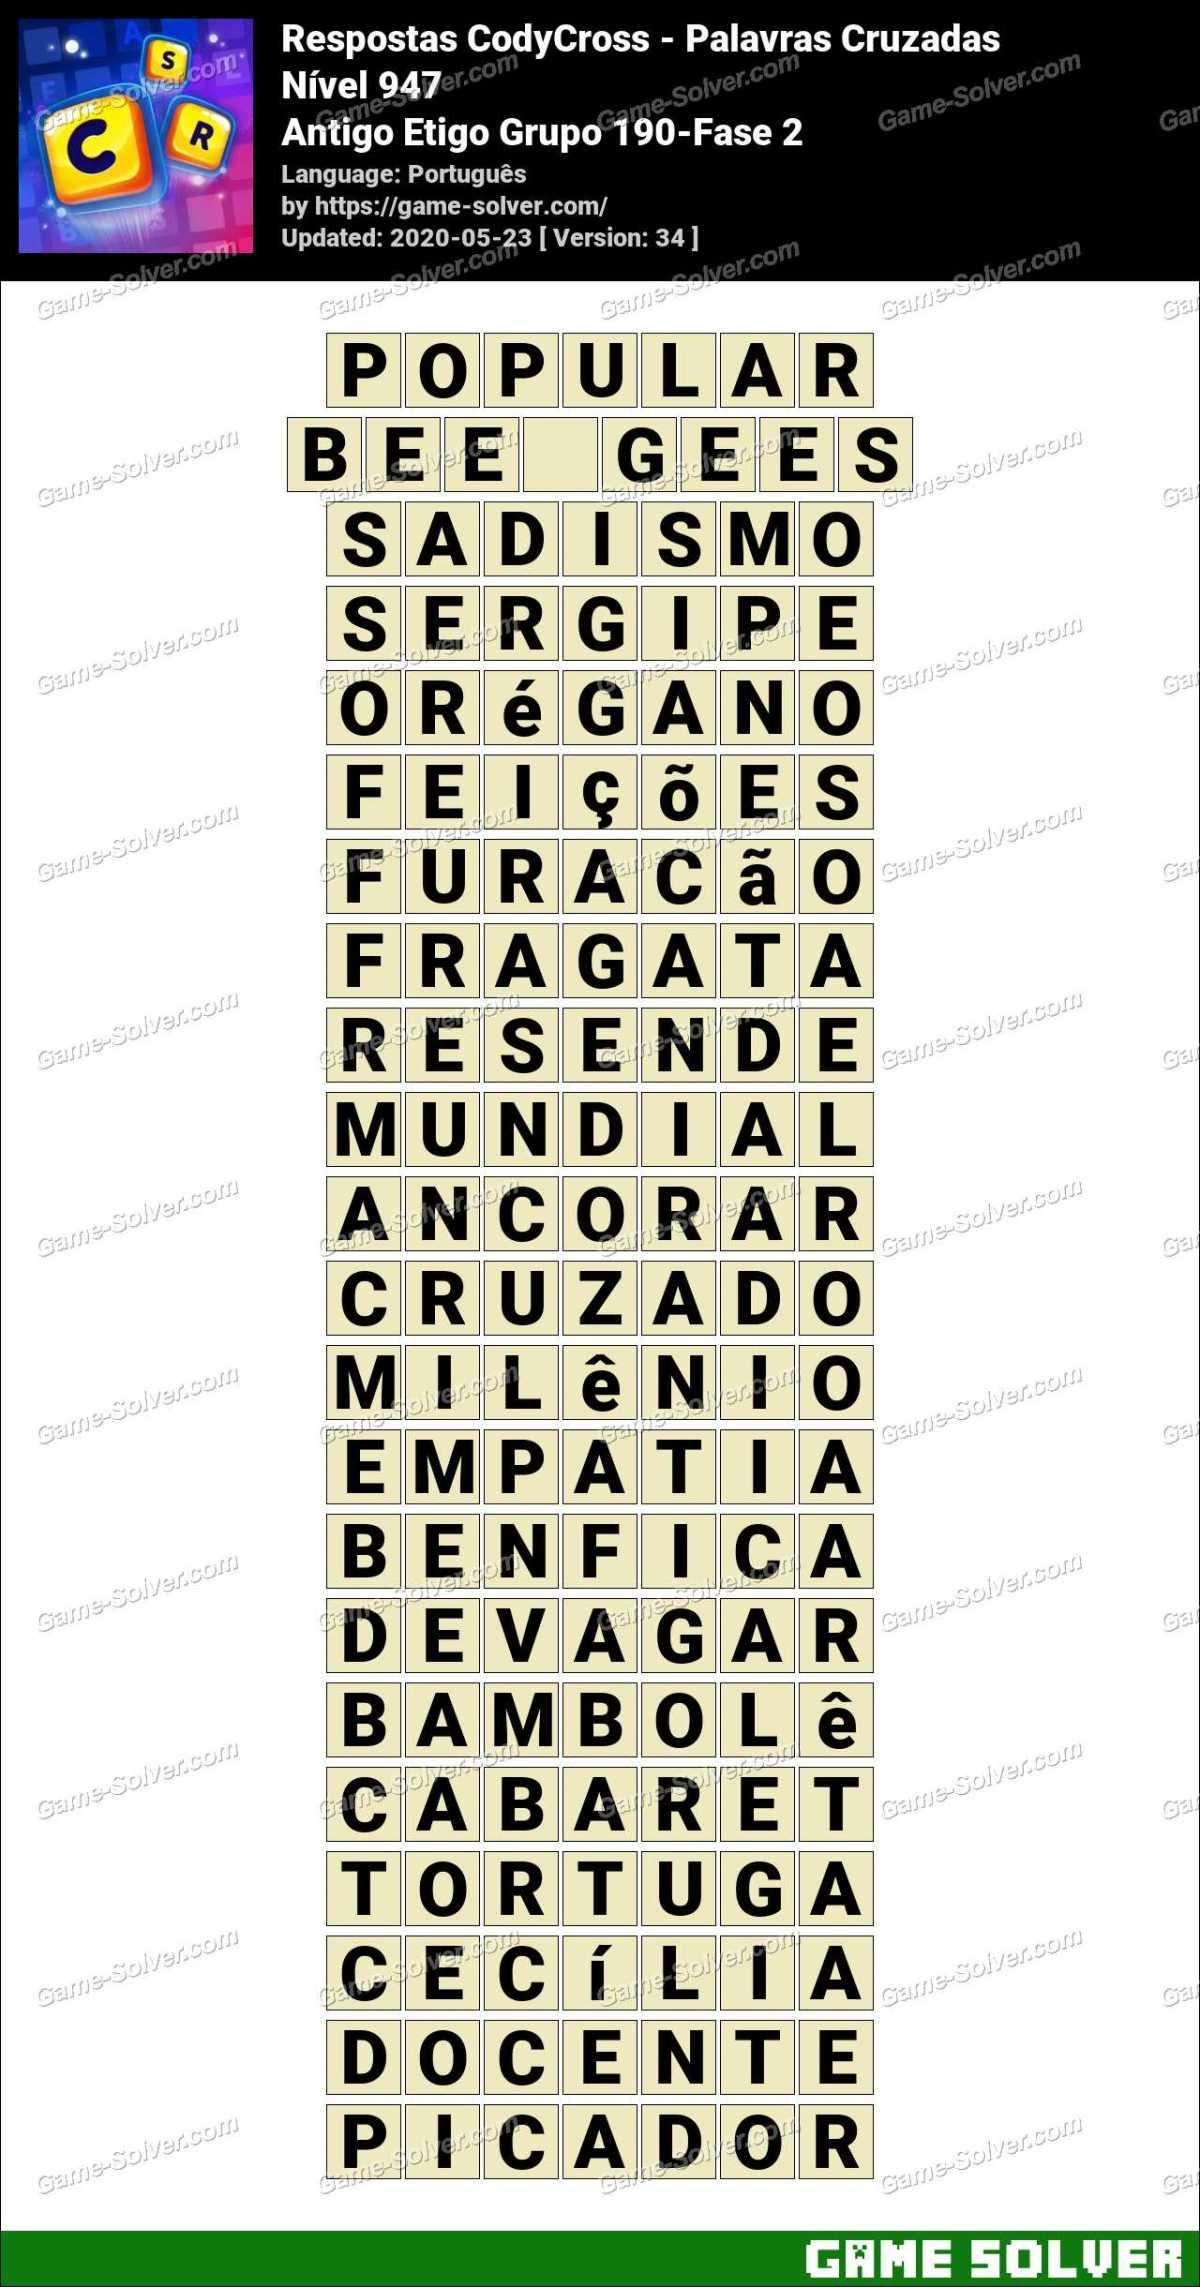 Respostas CodyCross Antigo Etigo Grupo 190-Fase 2